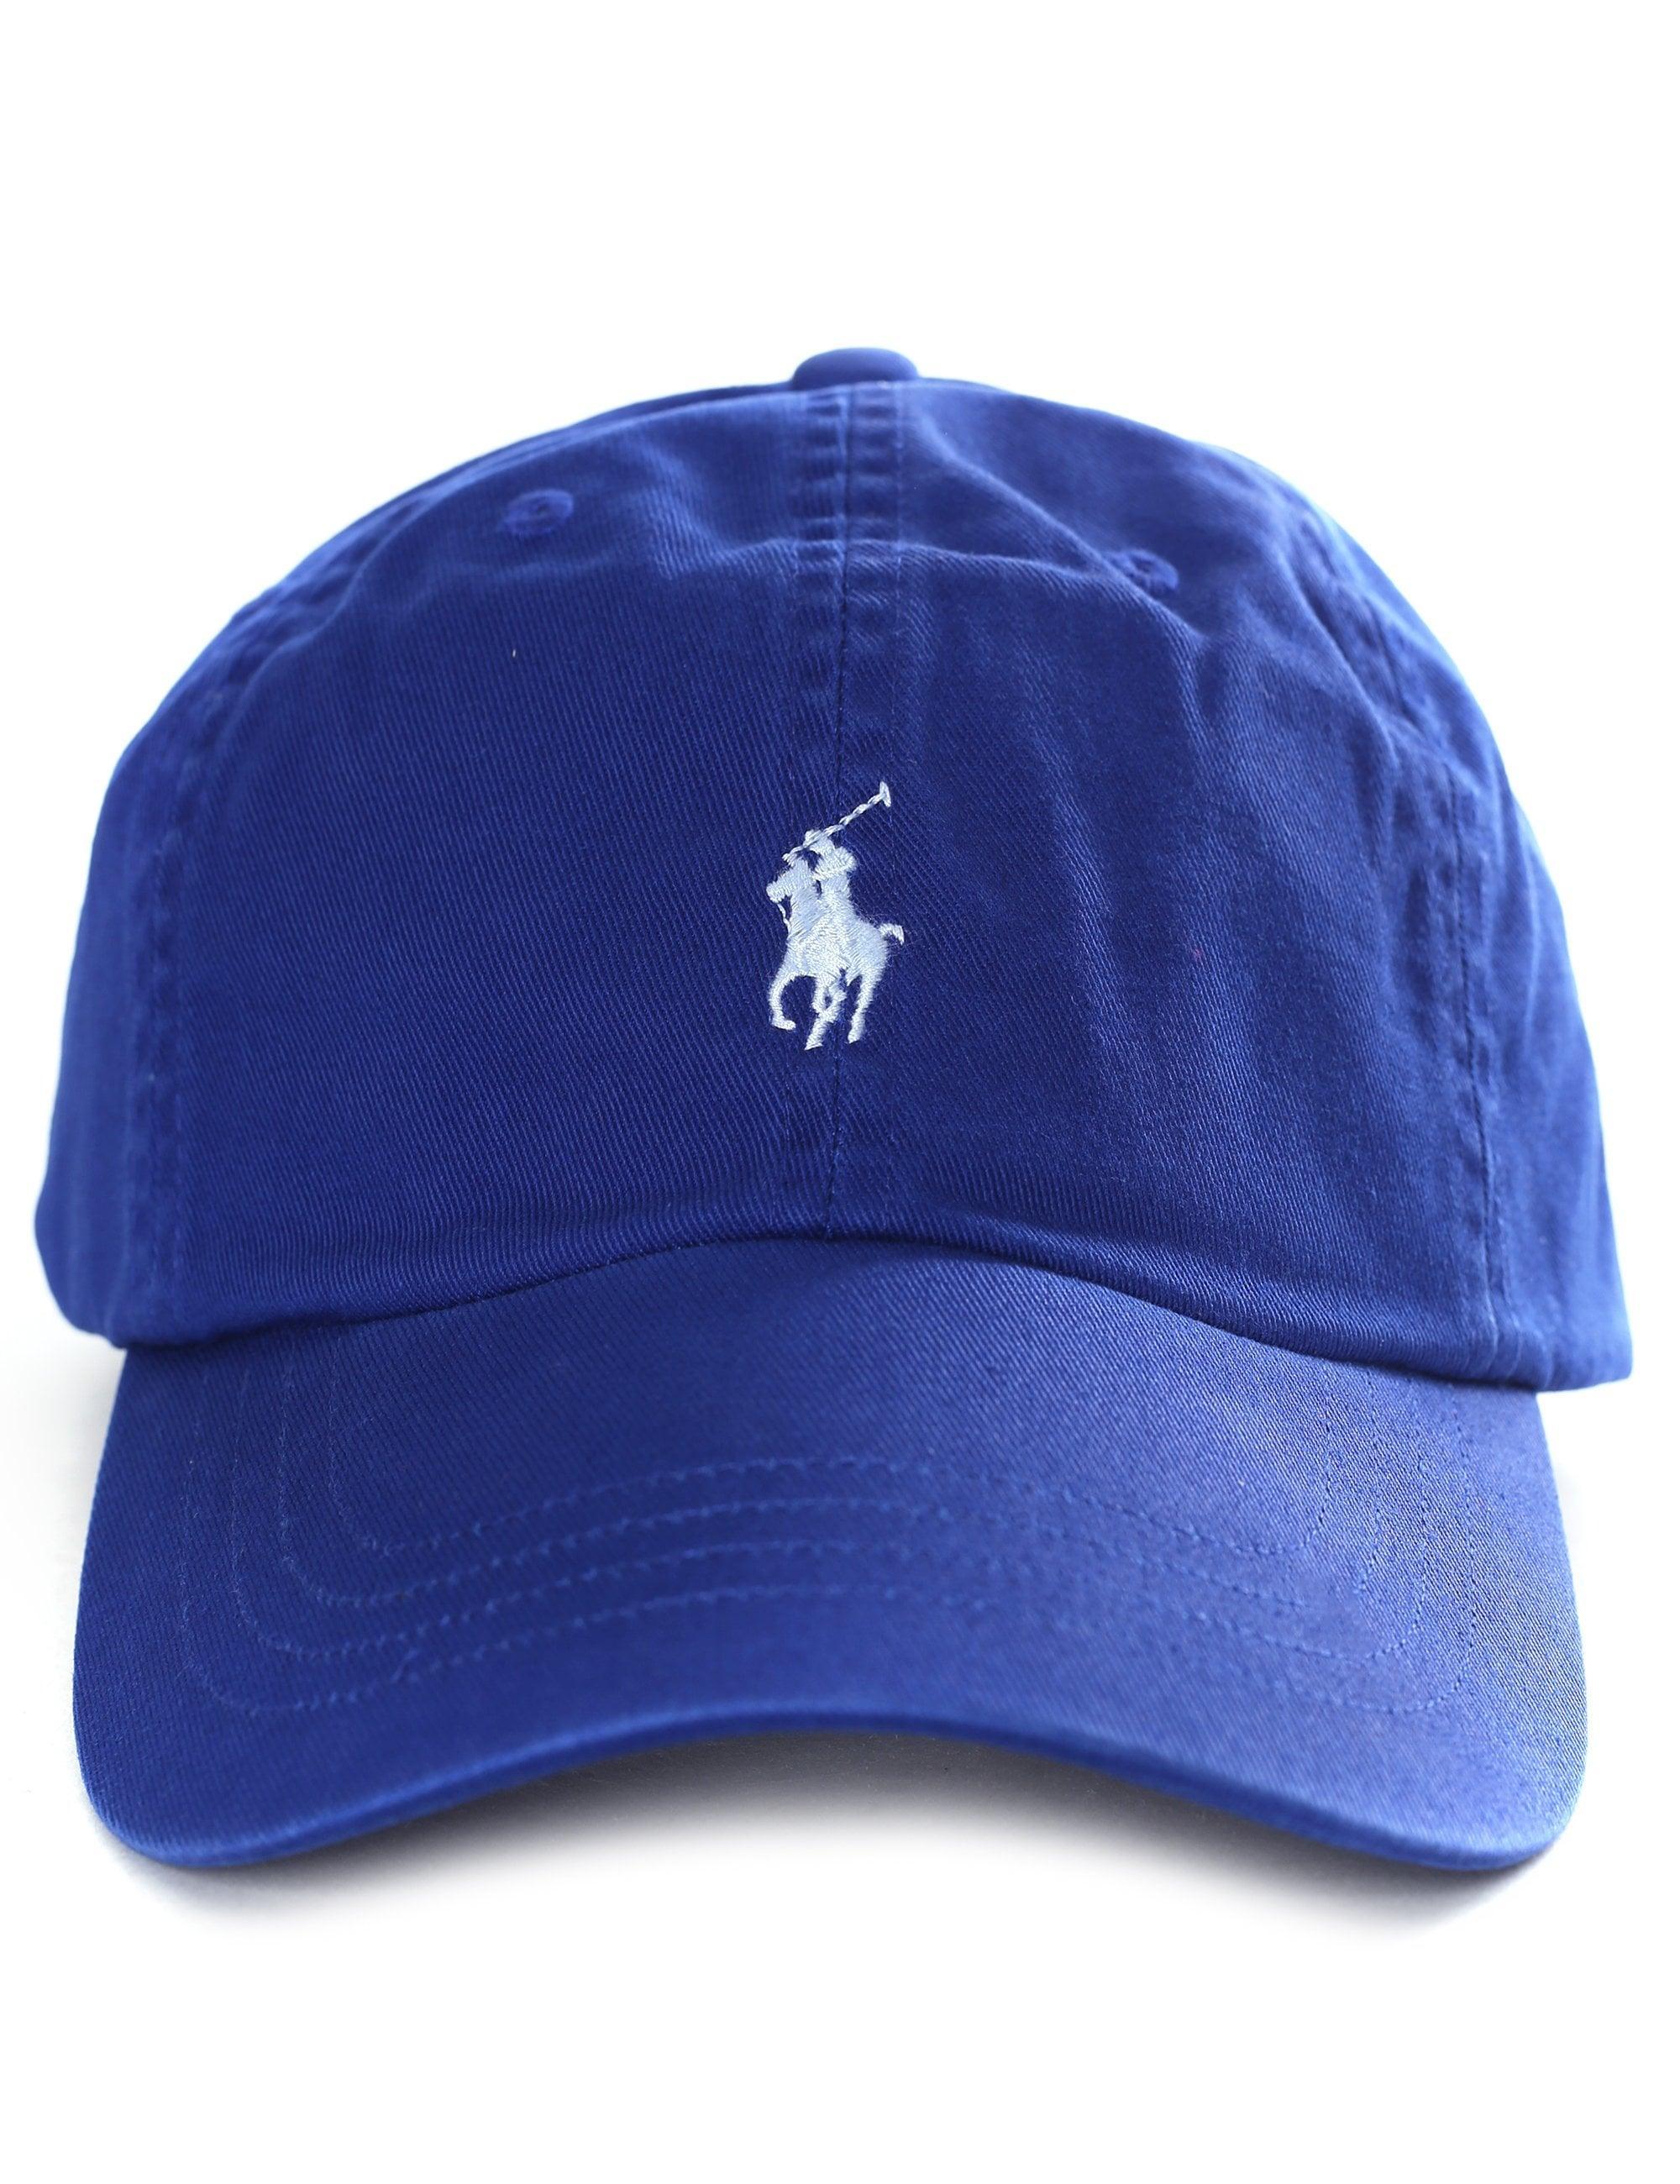 c5dc8c2623e Polo Ralph Lauren Men s Classic Sport Cap in Blue for Men - Lyst